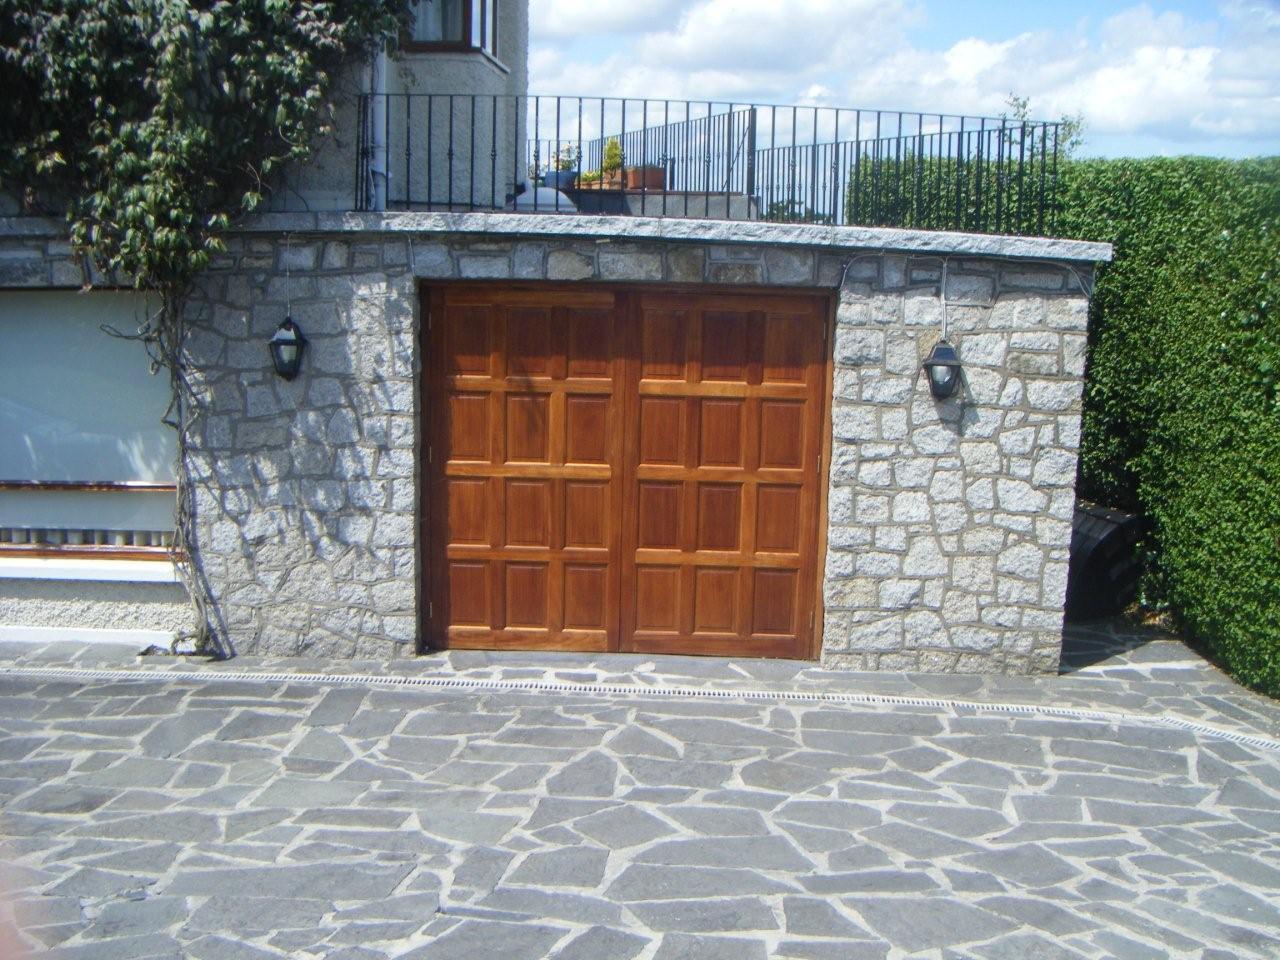 Teak doors to garage conversion in Dalkey.